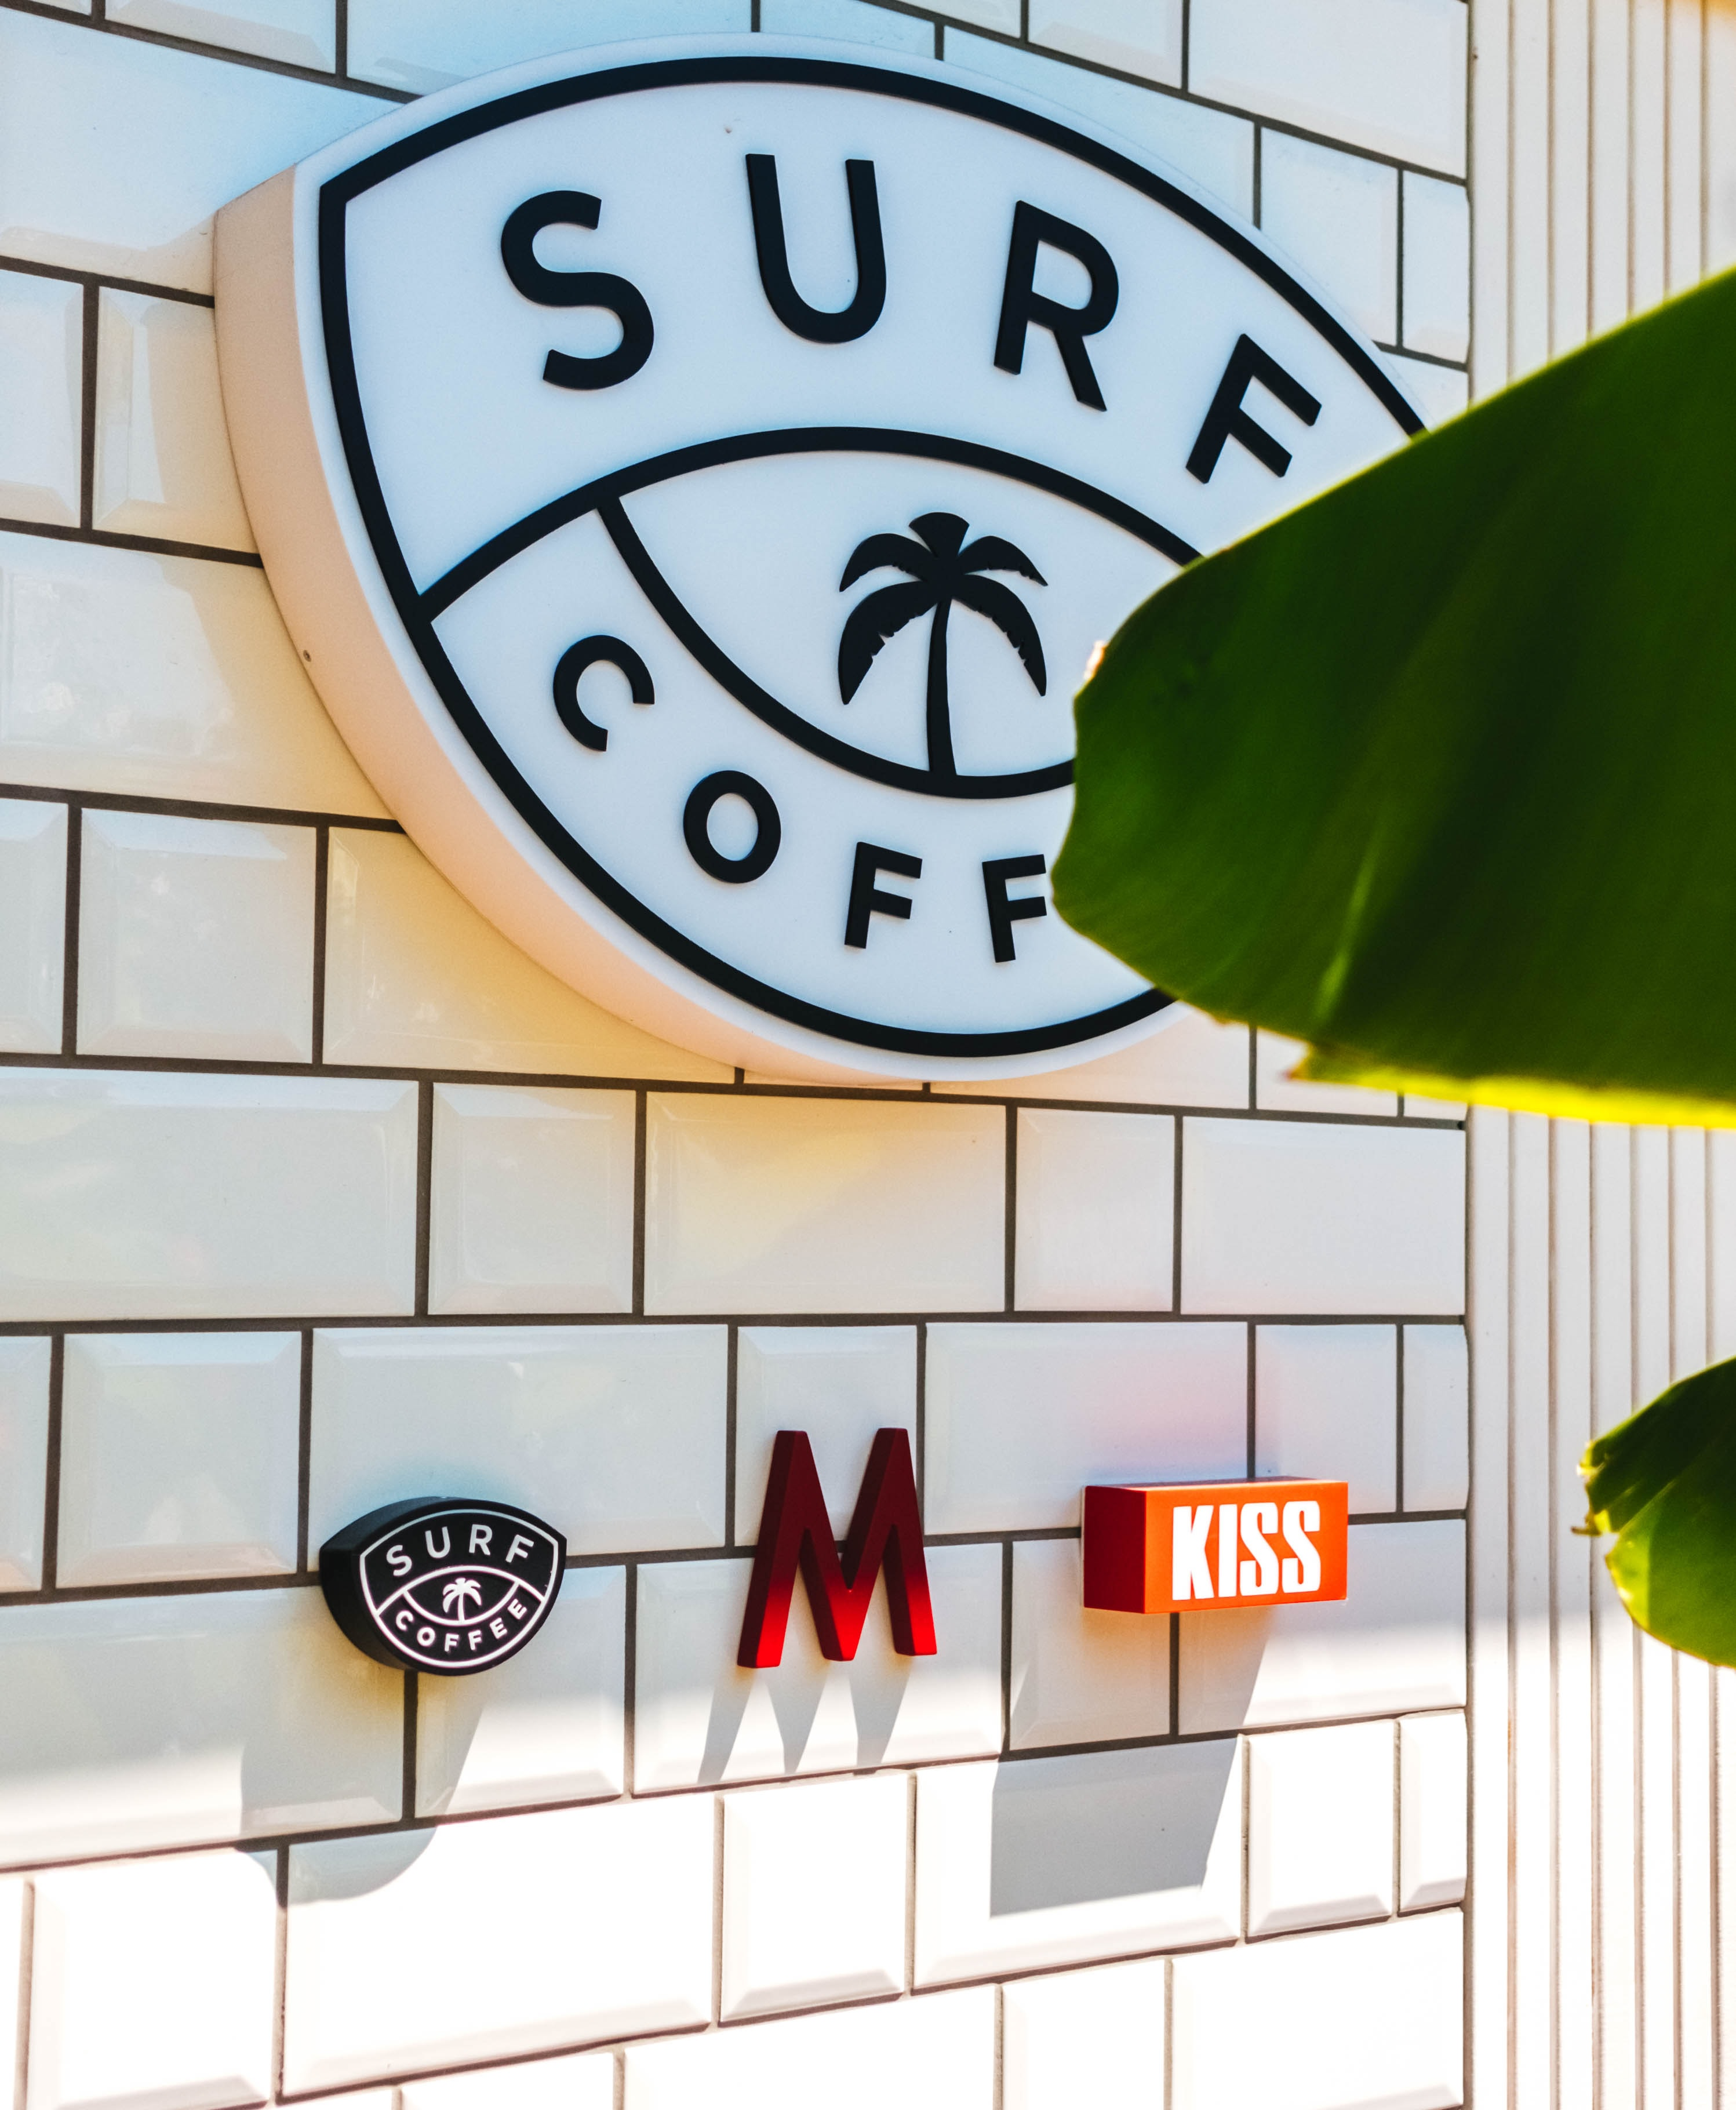 Sure Coffee signage